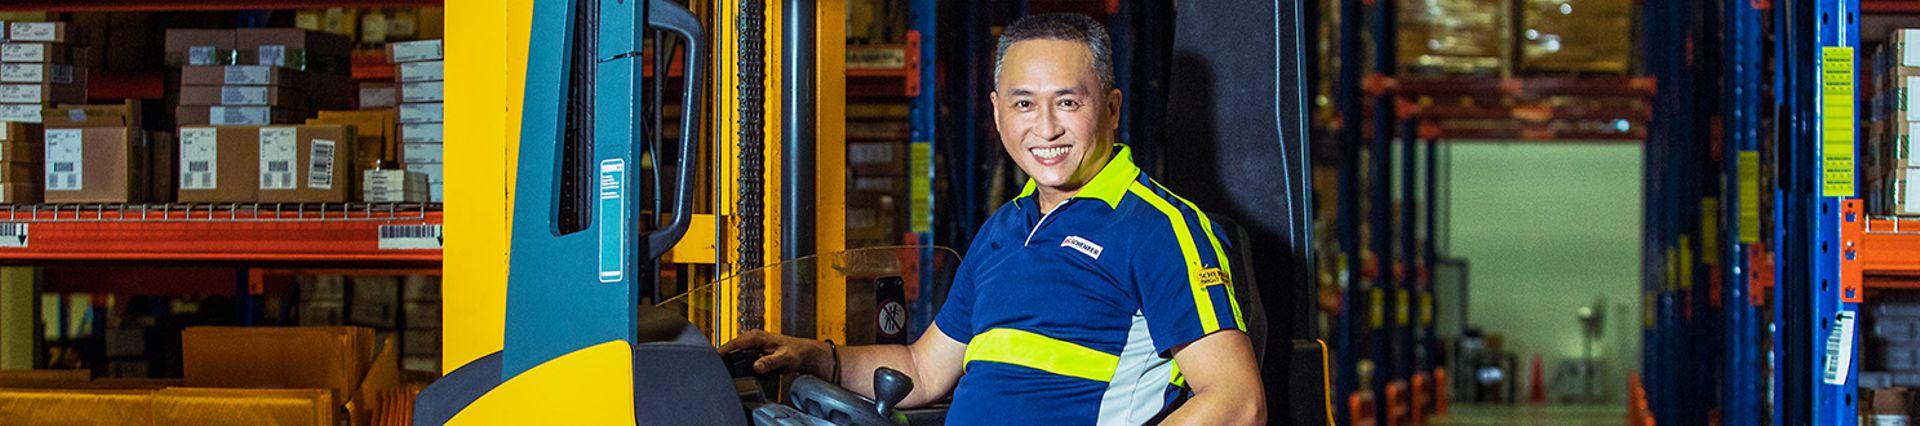 DB_Schenker_M58_Professional Blue Collar Male_Forklift Driver